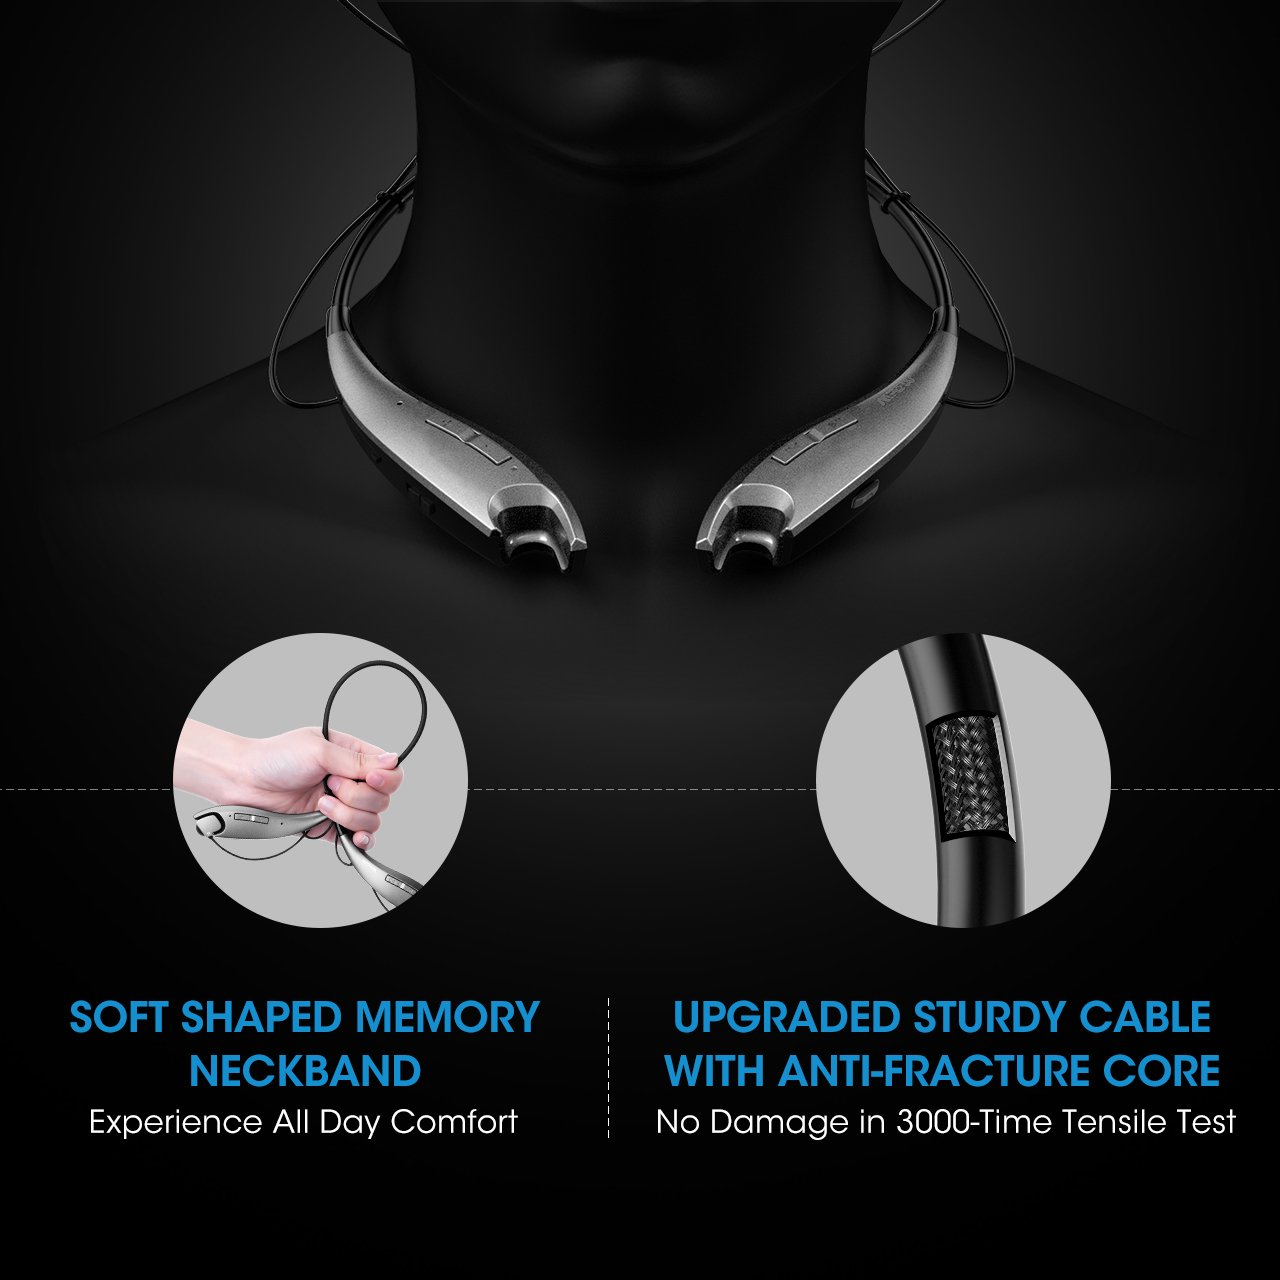 Blue Mpow Jaws Gen-3 Bluetooth Headphones Wireless Neckband Headphones w//13 Hours Playtime /& CVC 6.0 Noise Cancelling Mic,Wireless Neckband Headset w//Call Vibrate Alert,Bluetooth Magnetic Earphones